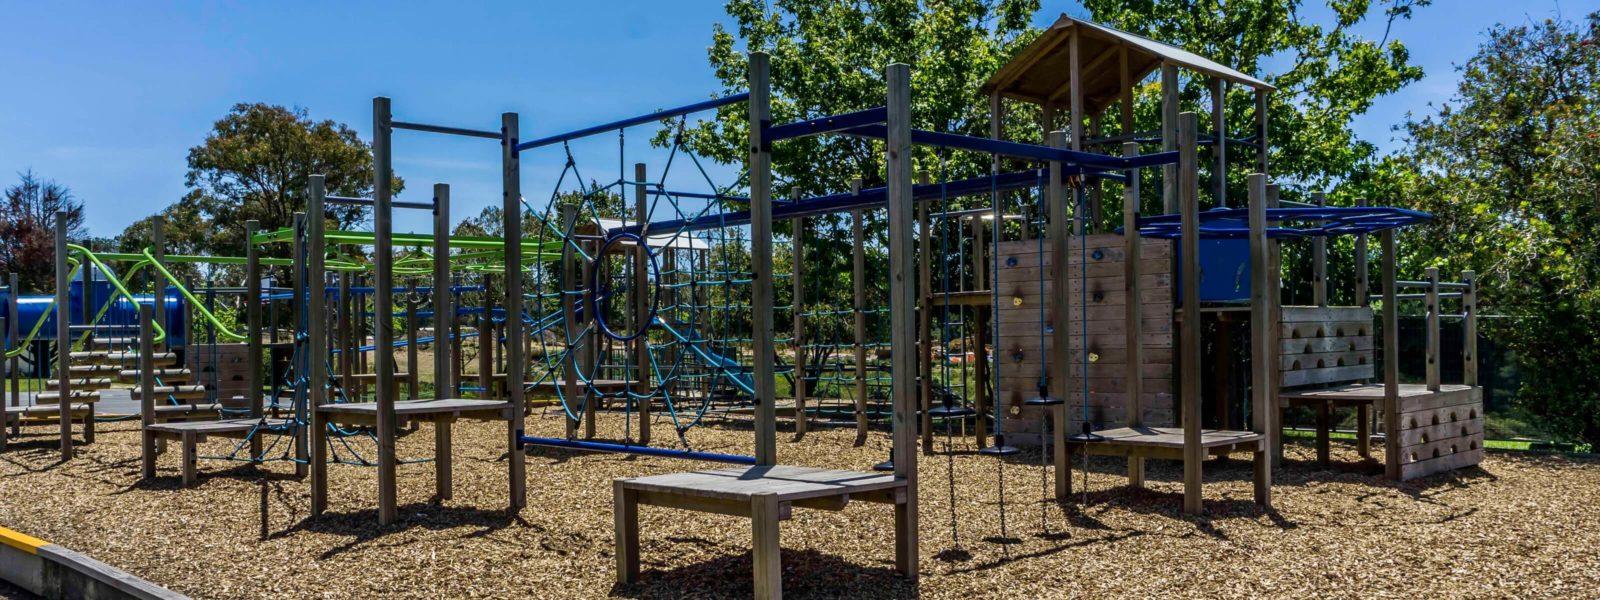 Long Bay Playco Playground